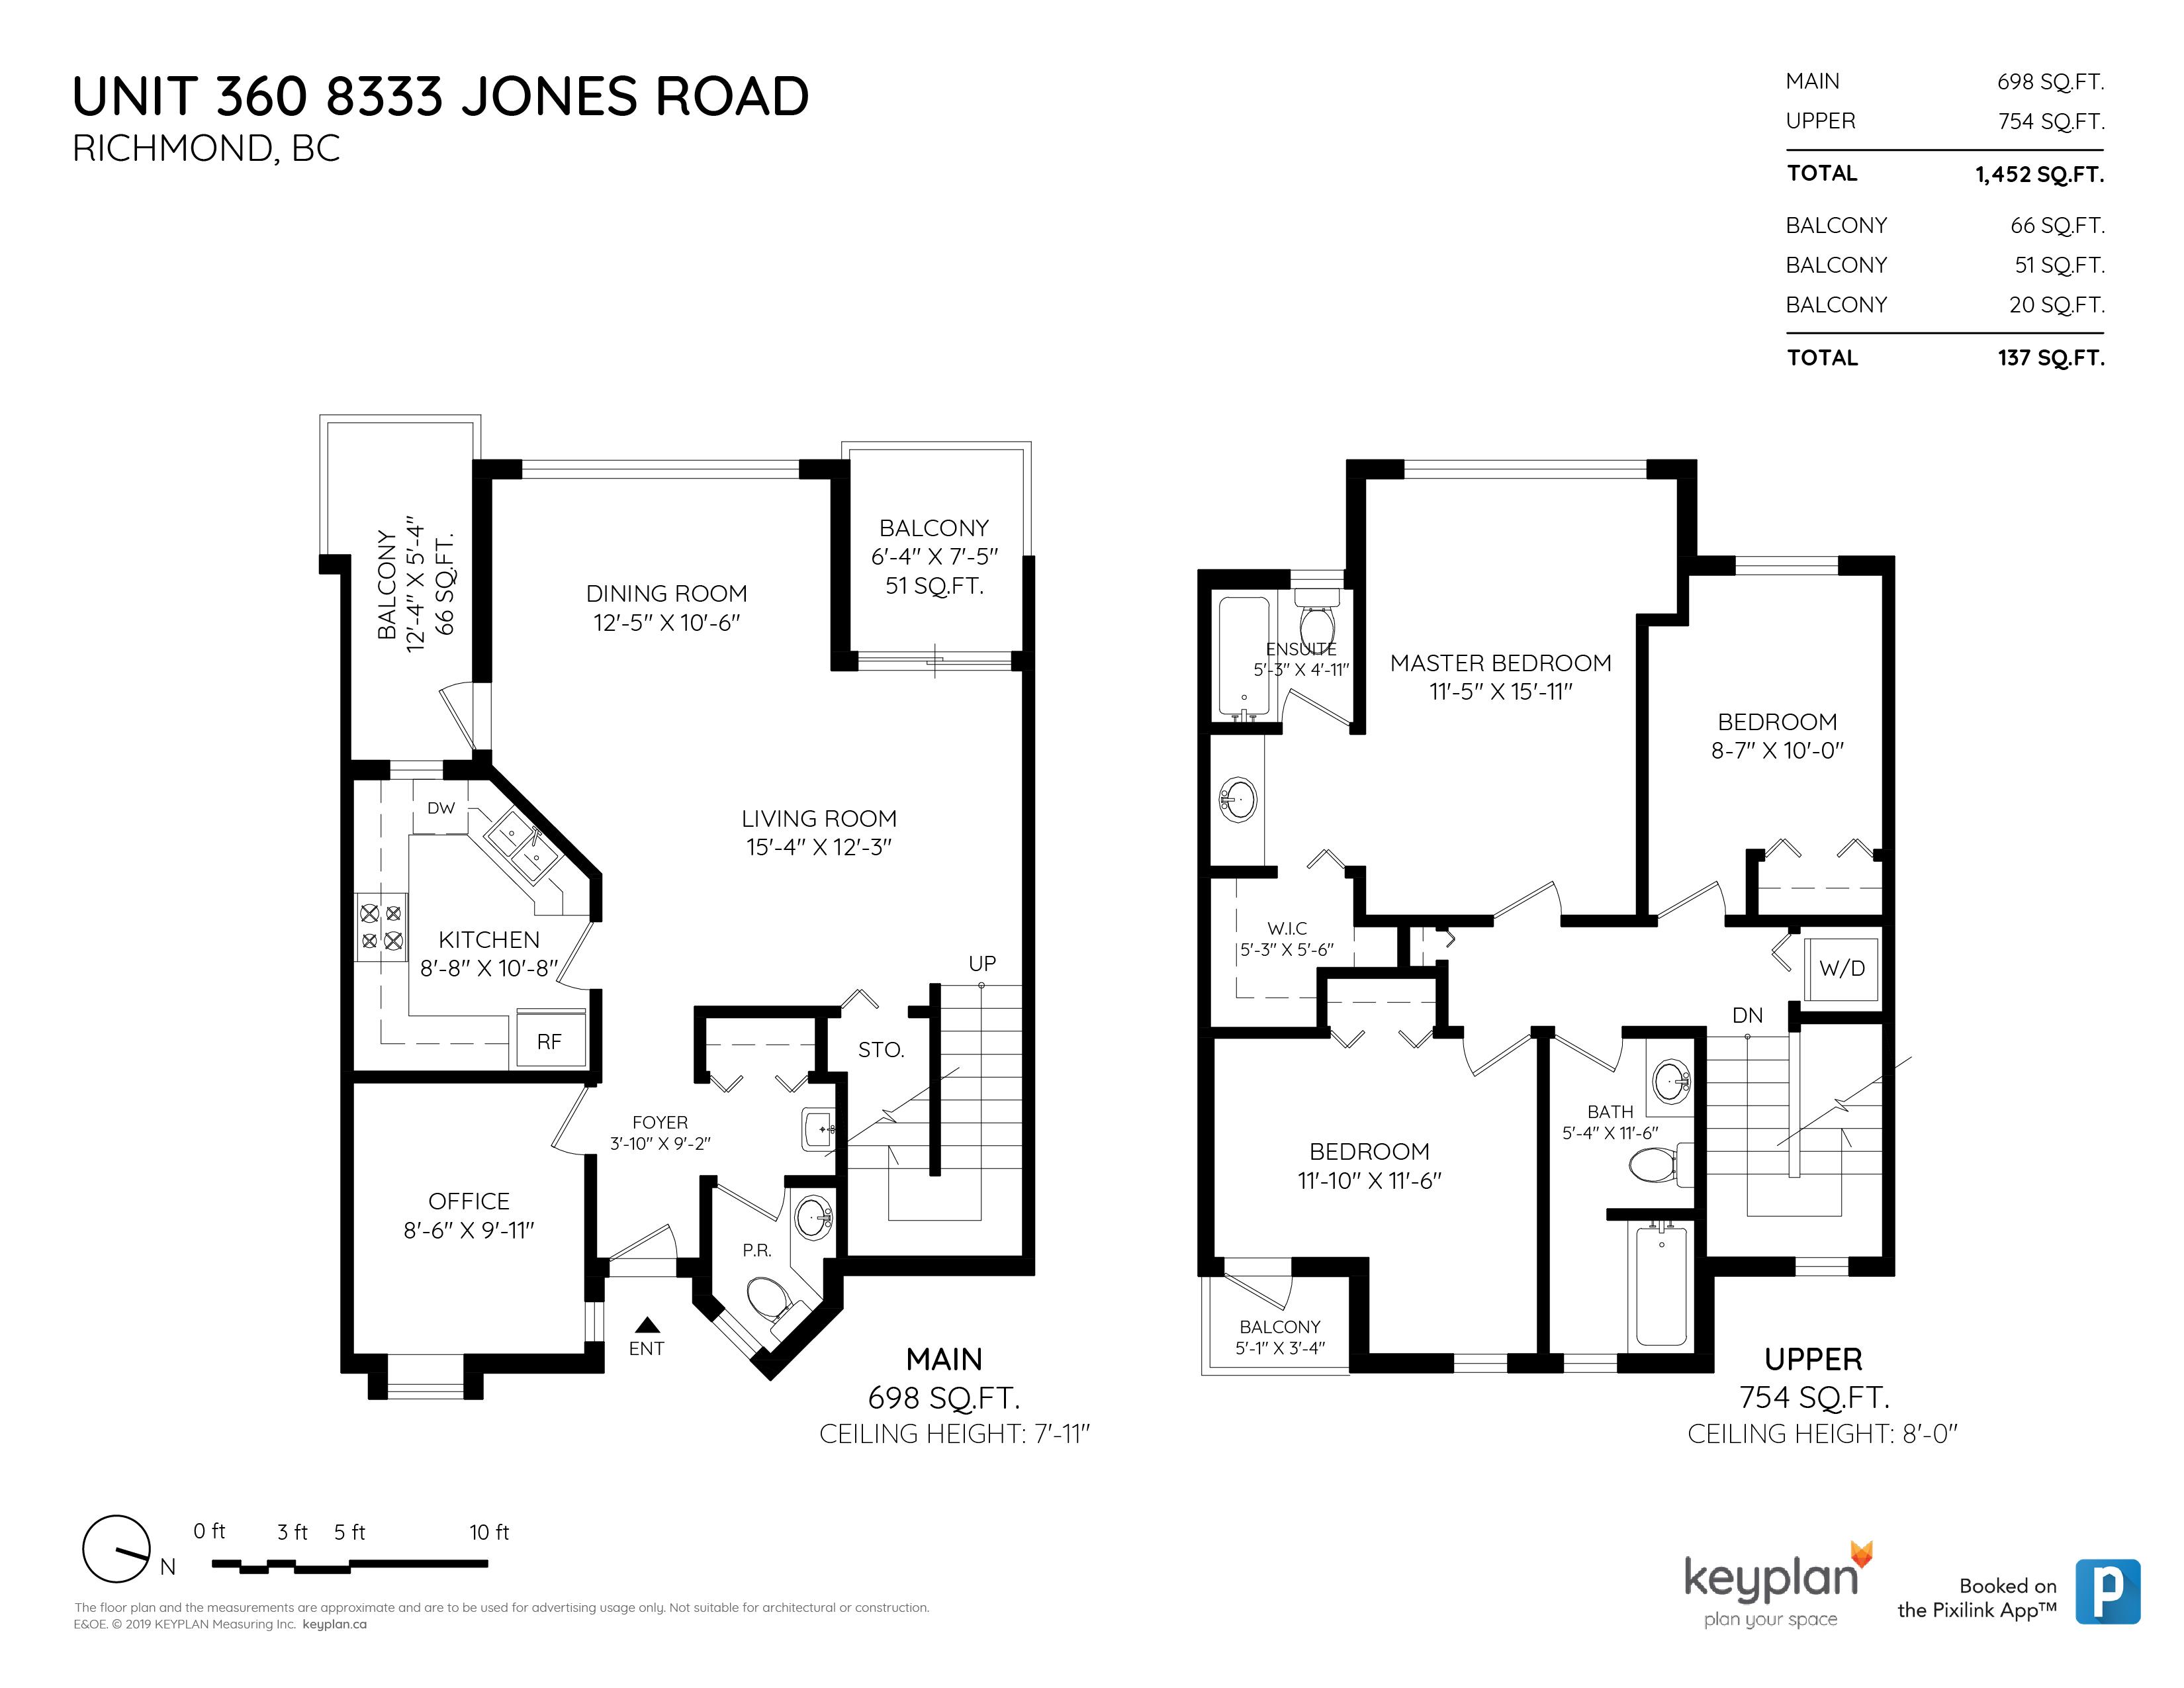 360 8333 JONES ROAD, Richmond, BC Floor Plan